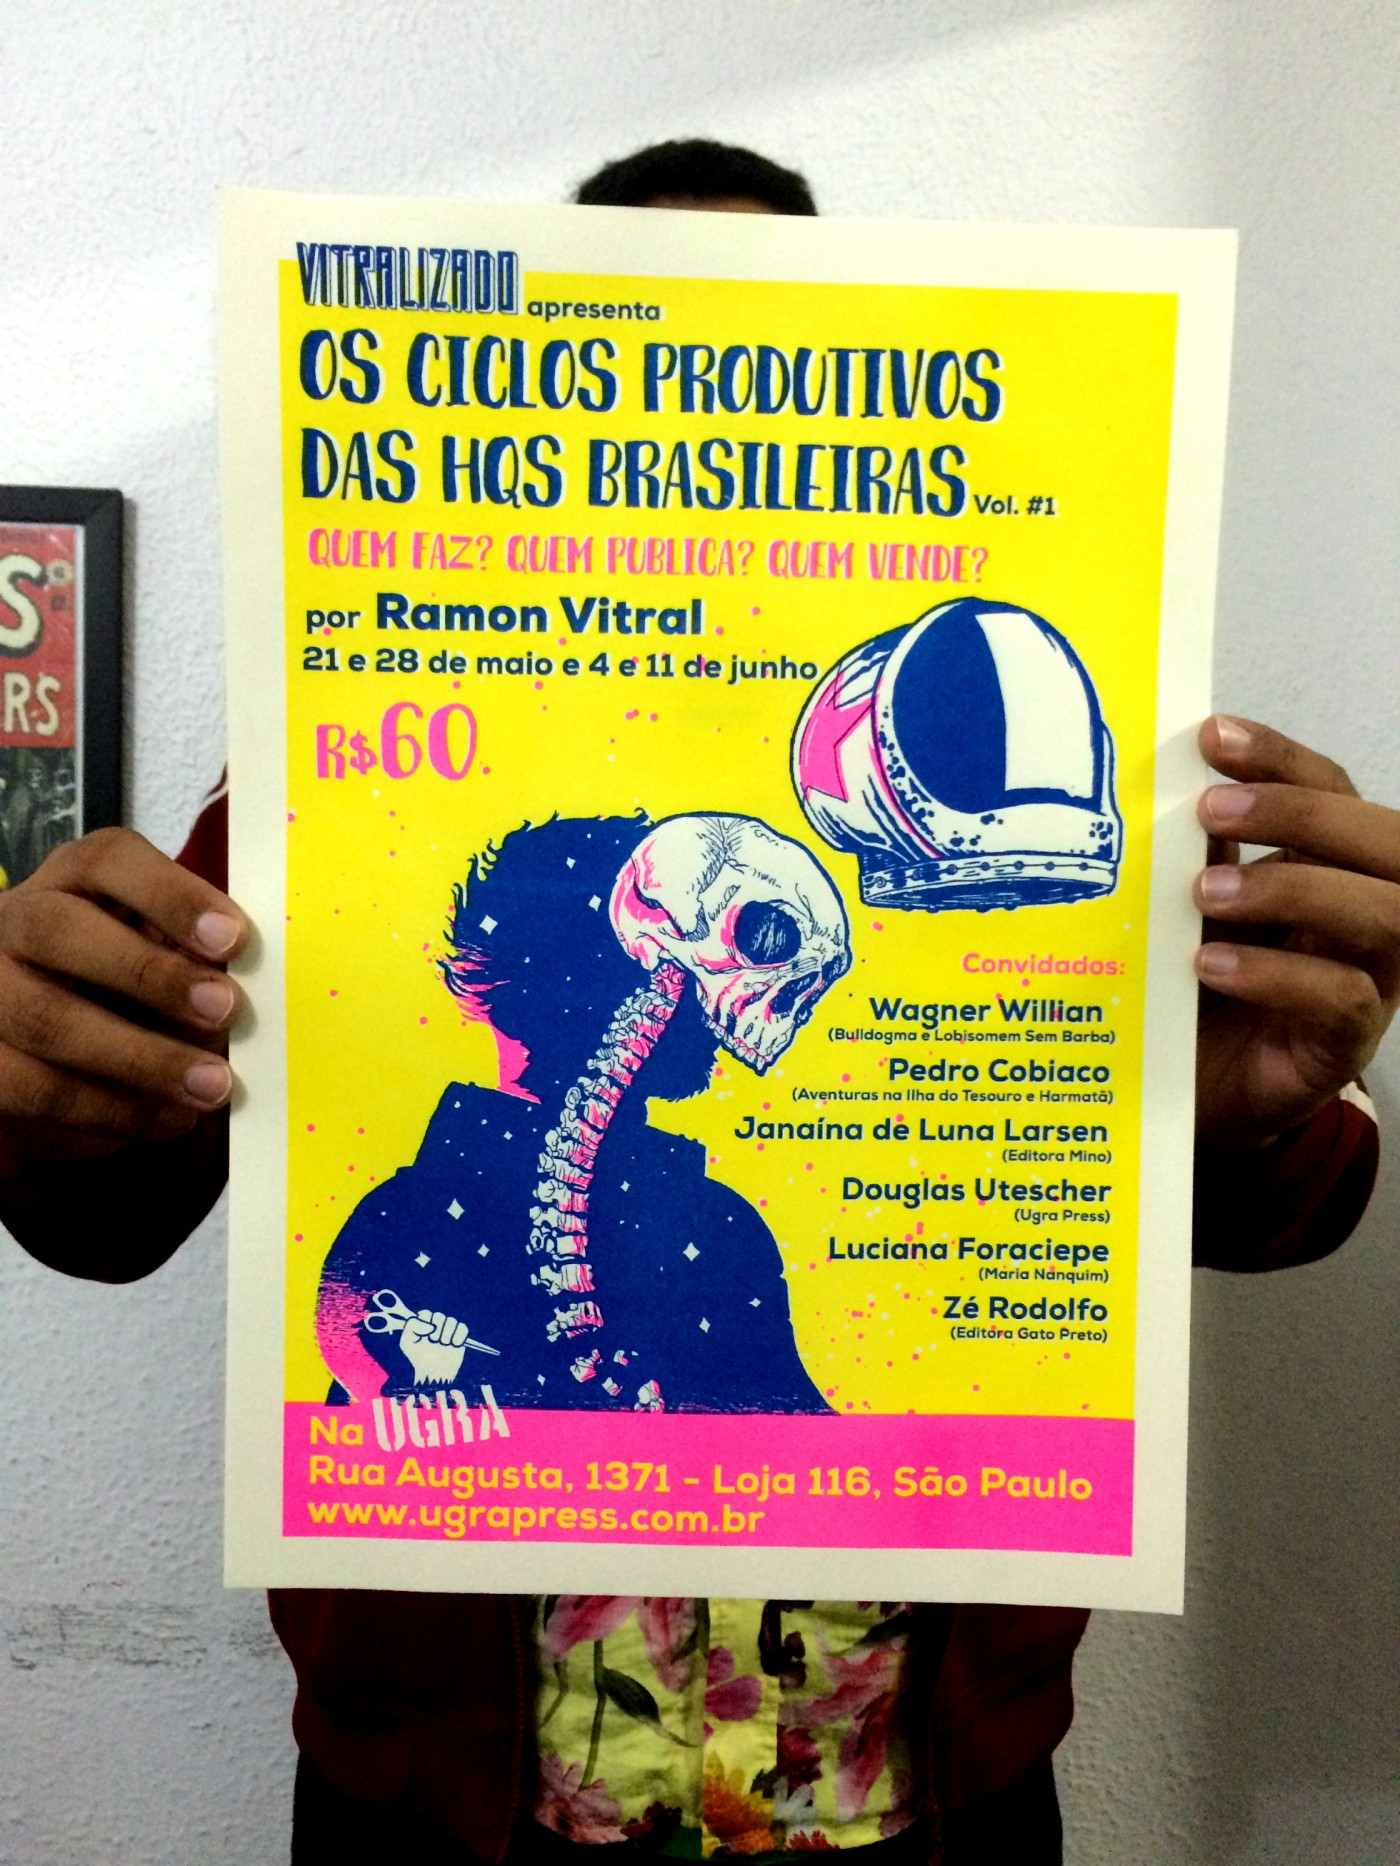 O cartaz do curso Os Ciclos Produtivos das HQs Brasileiras